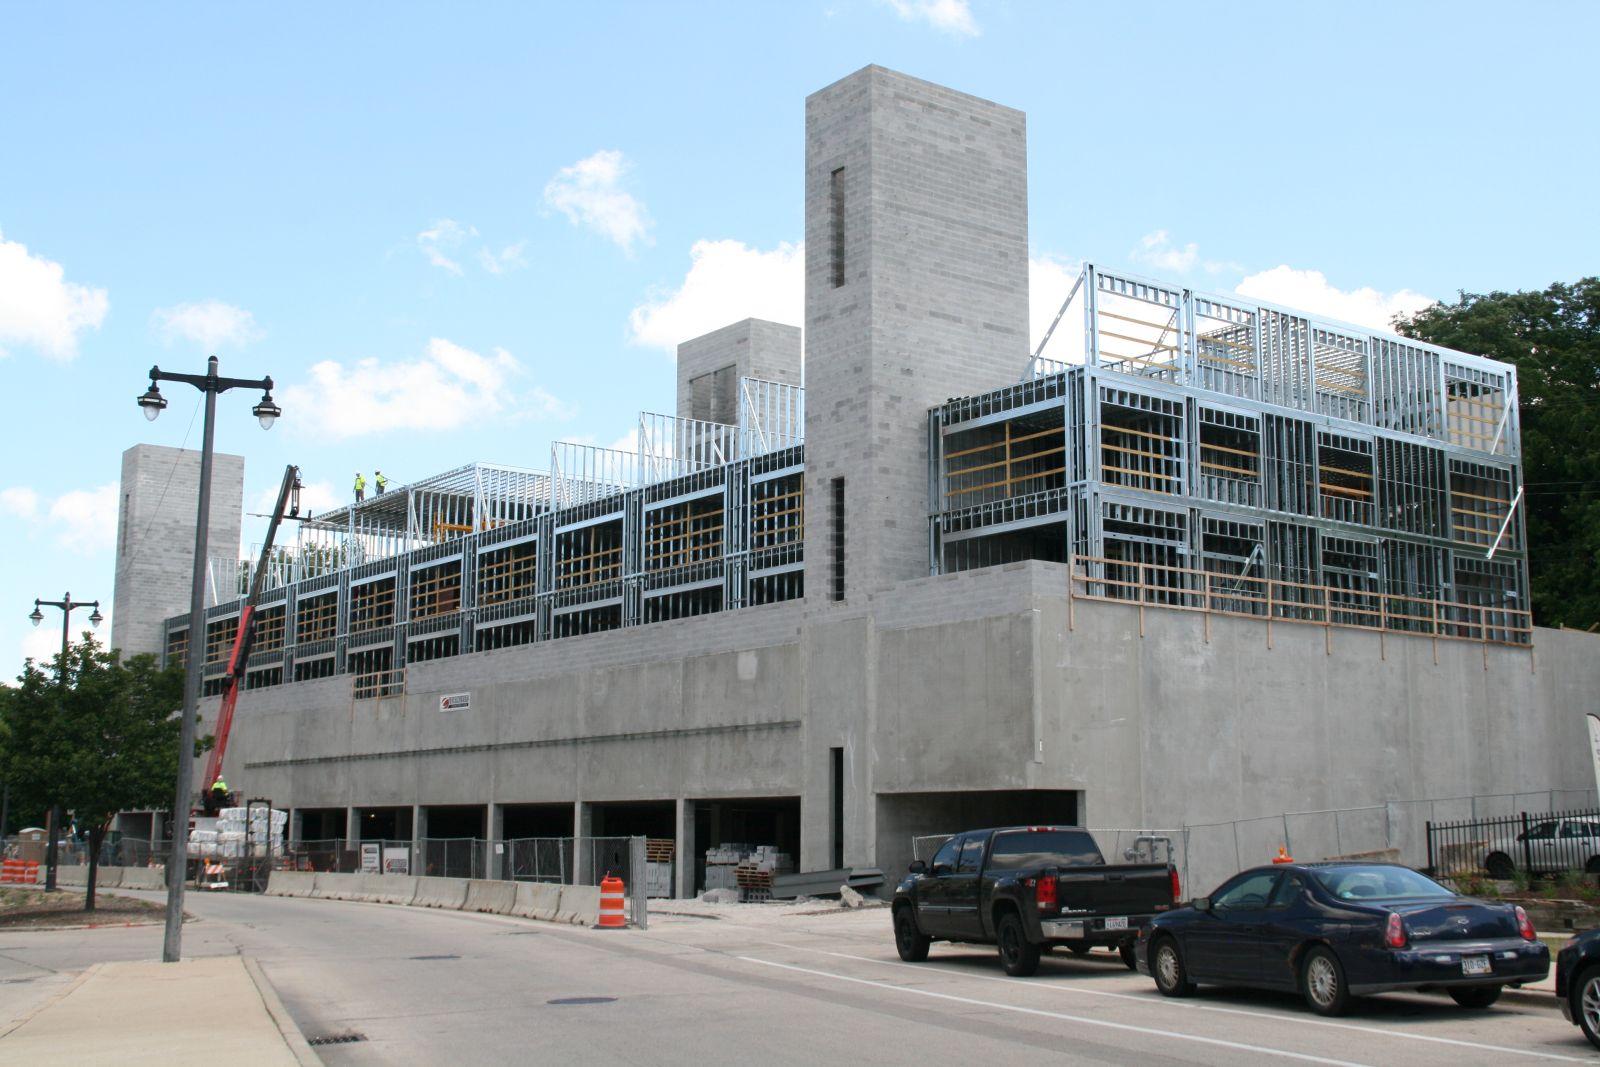 Construction at Rhythm Apartments